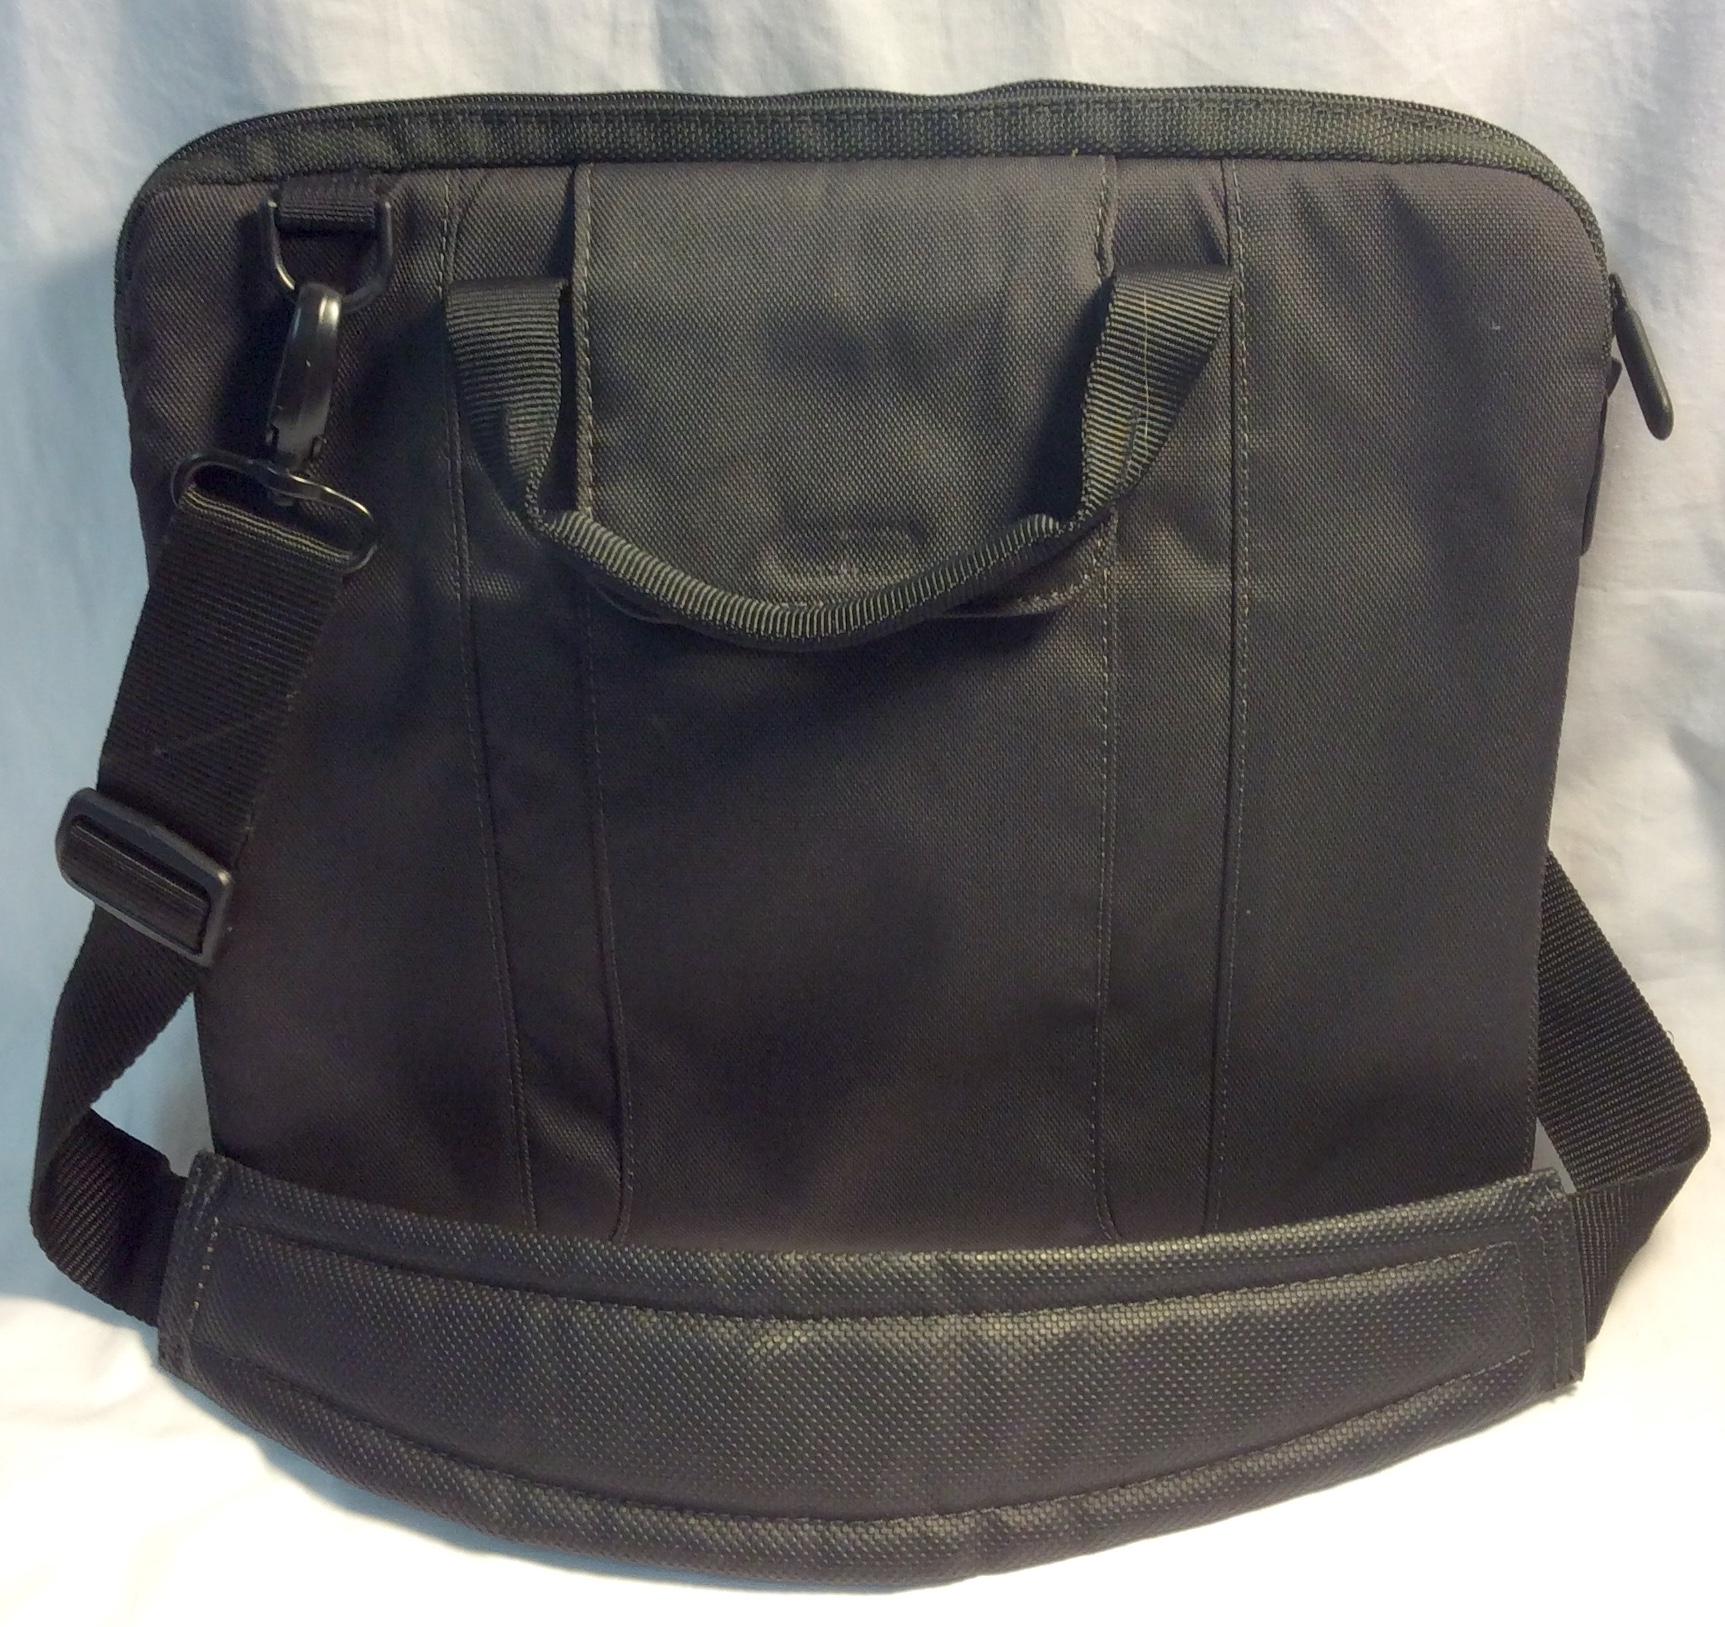 Small black tablet bag